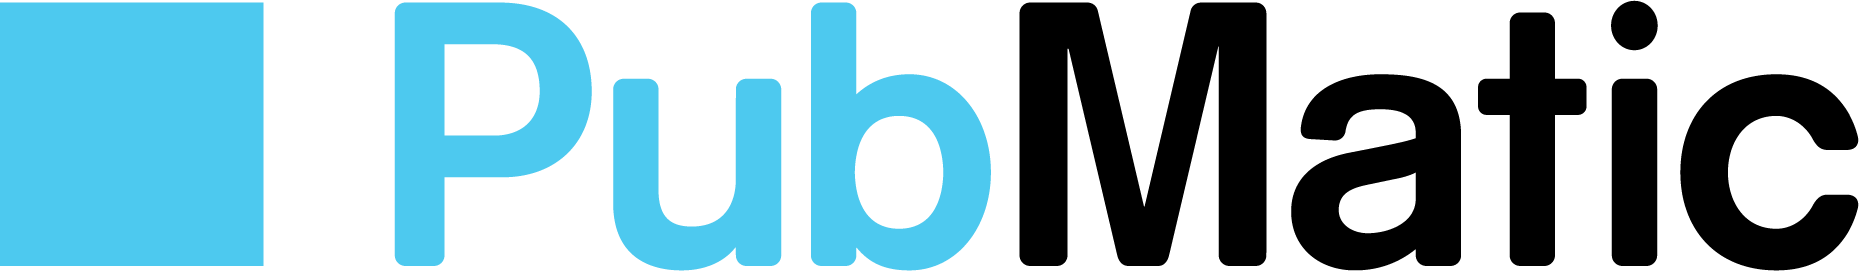 PubMatic_Logo.png